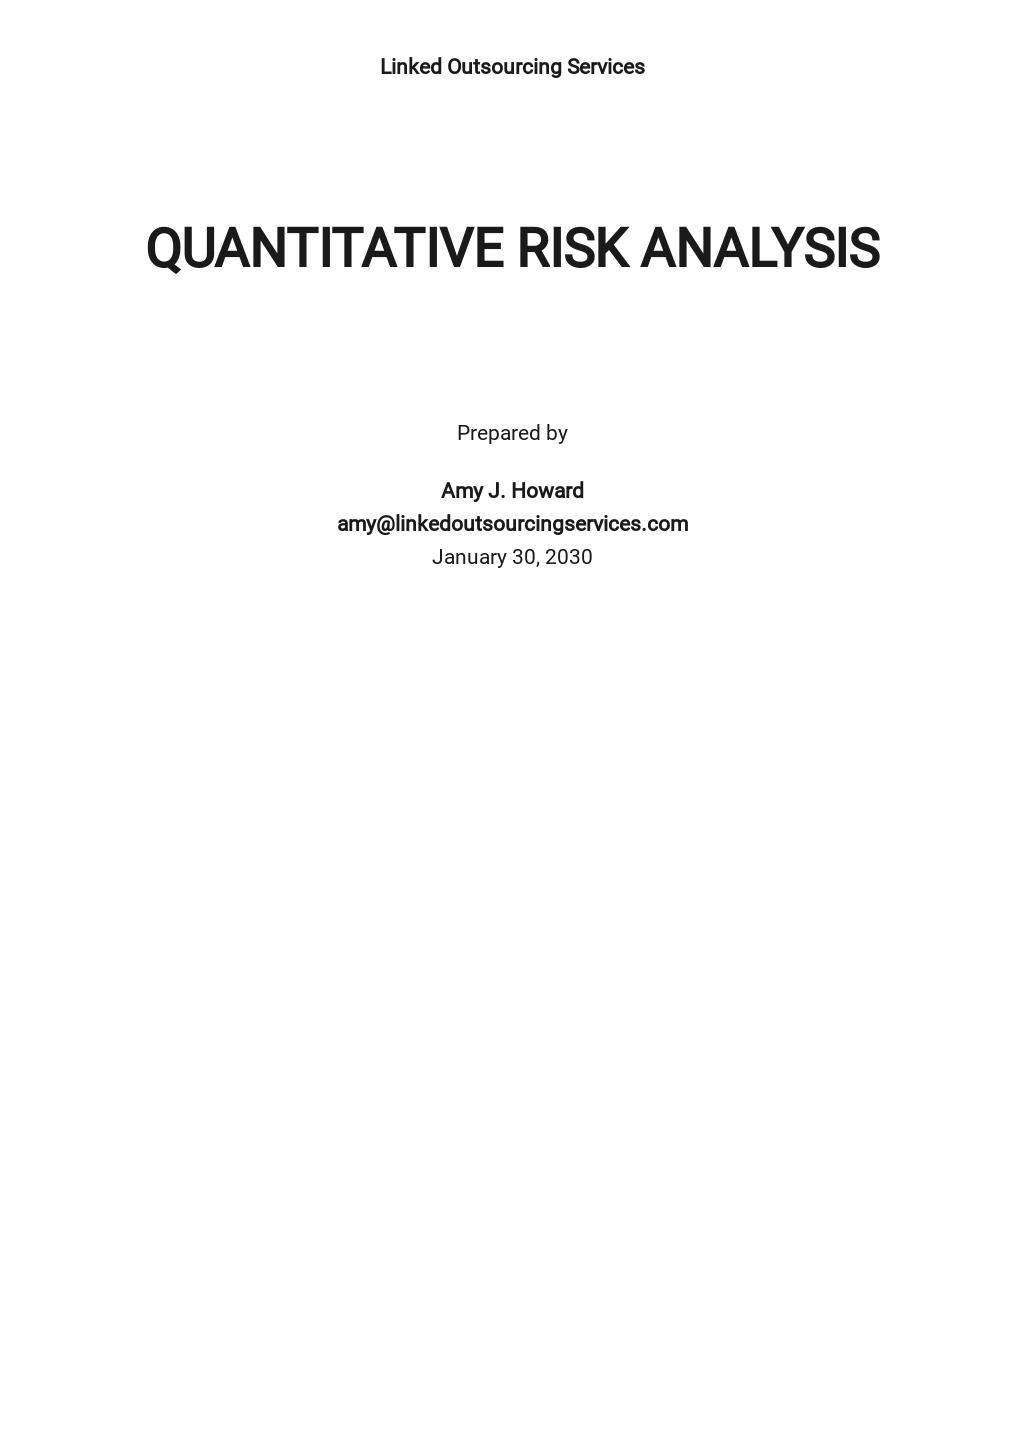 Quantitative Risk Analysis Template